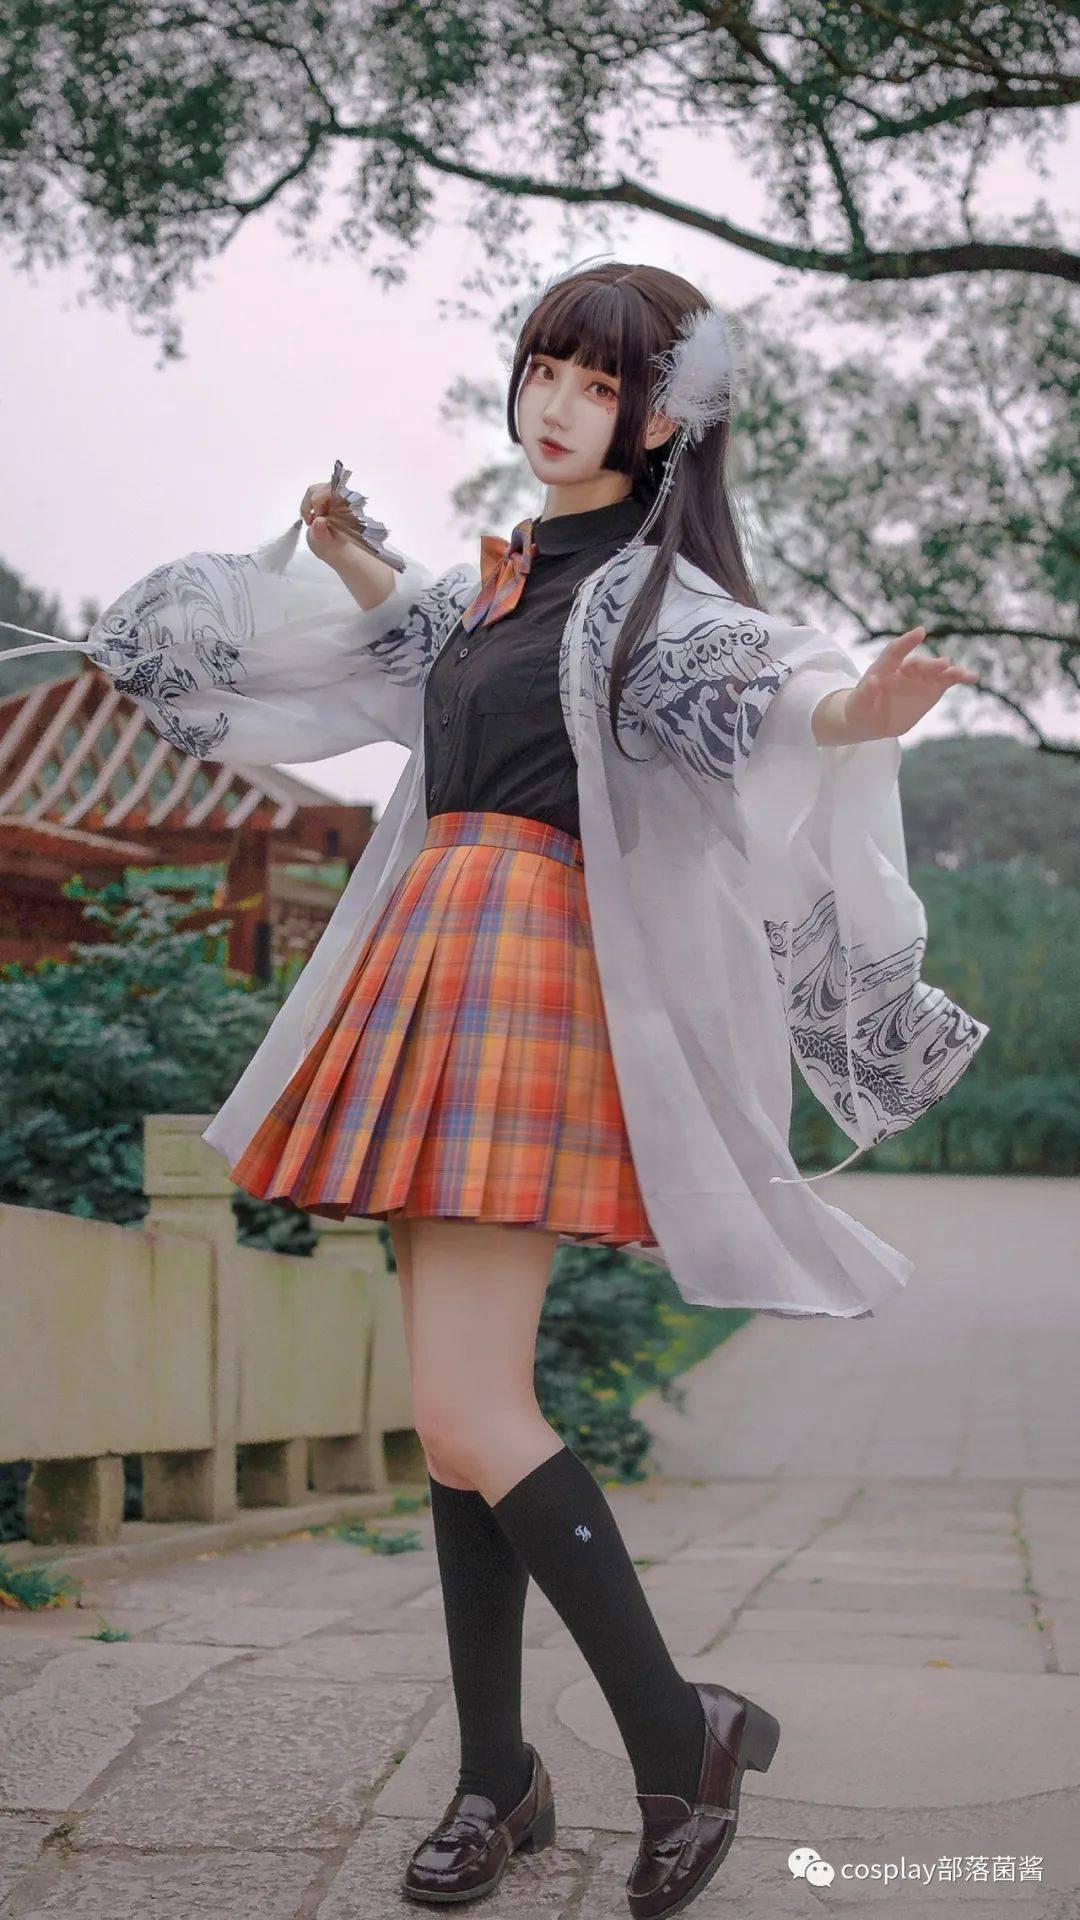 JK少女:梨园榆火,奈何仙女落人间